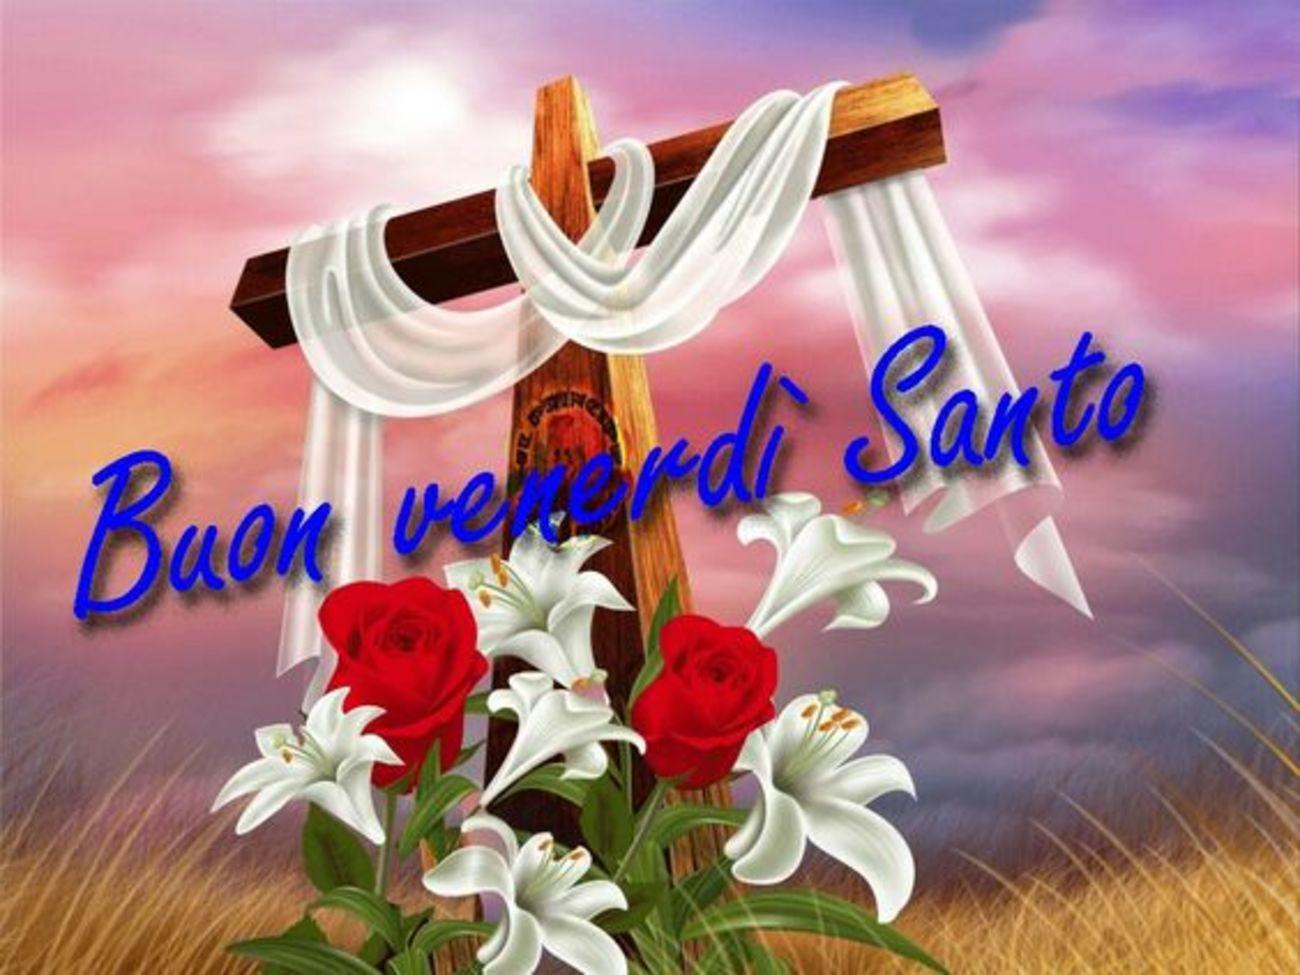 Buon Venerdi Santo Immagini Gesutiama It